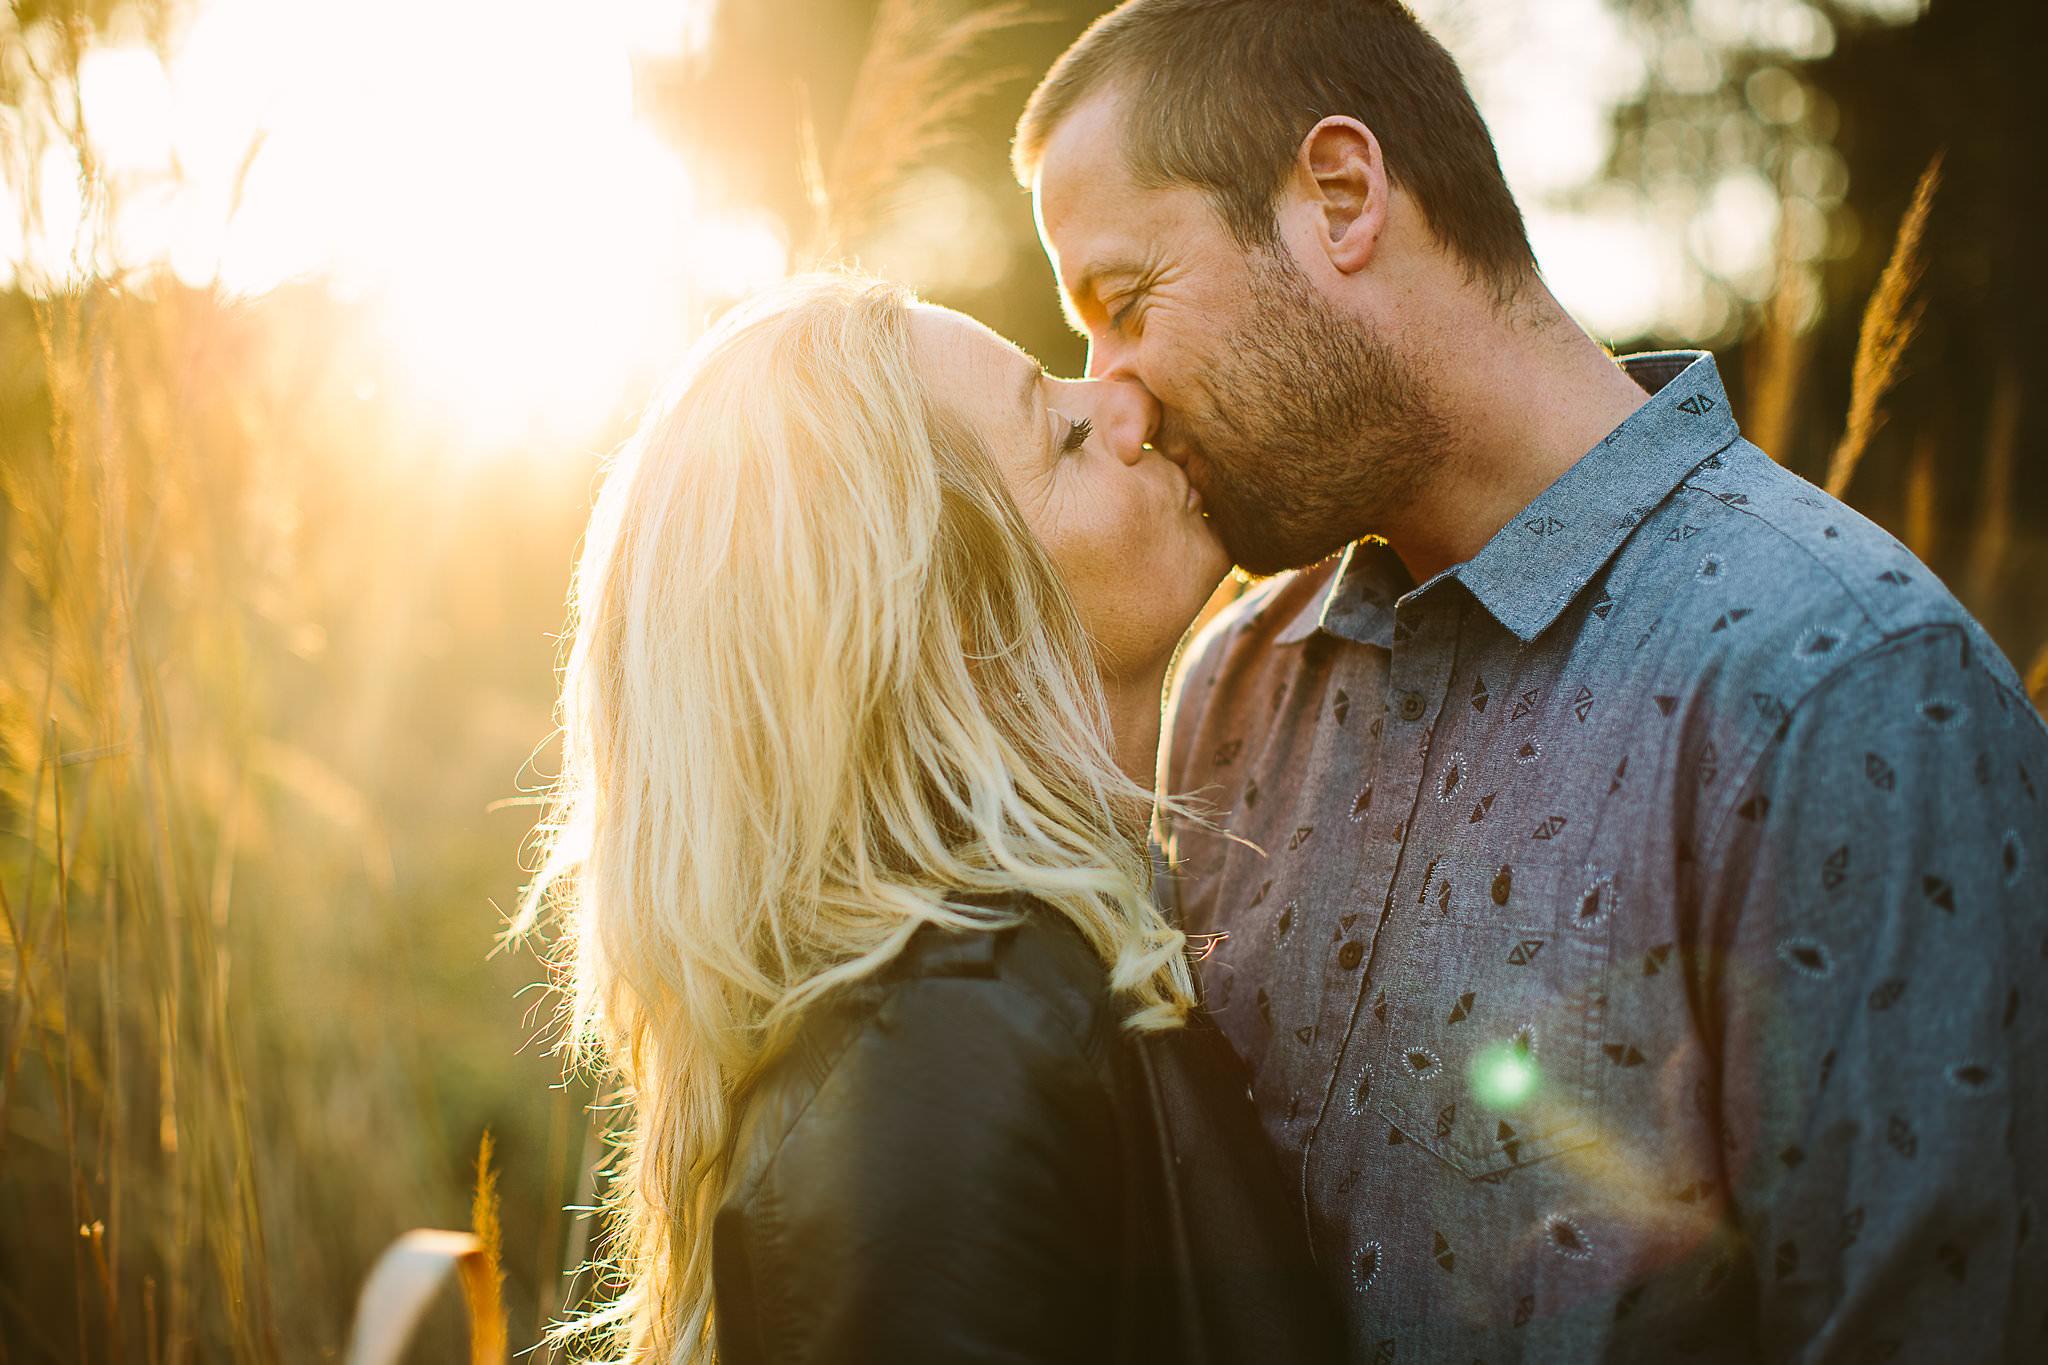 claire saucaz photographe de mariage a hossegor